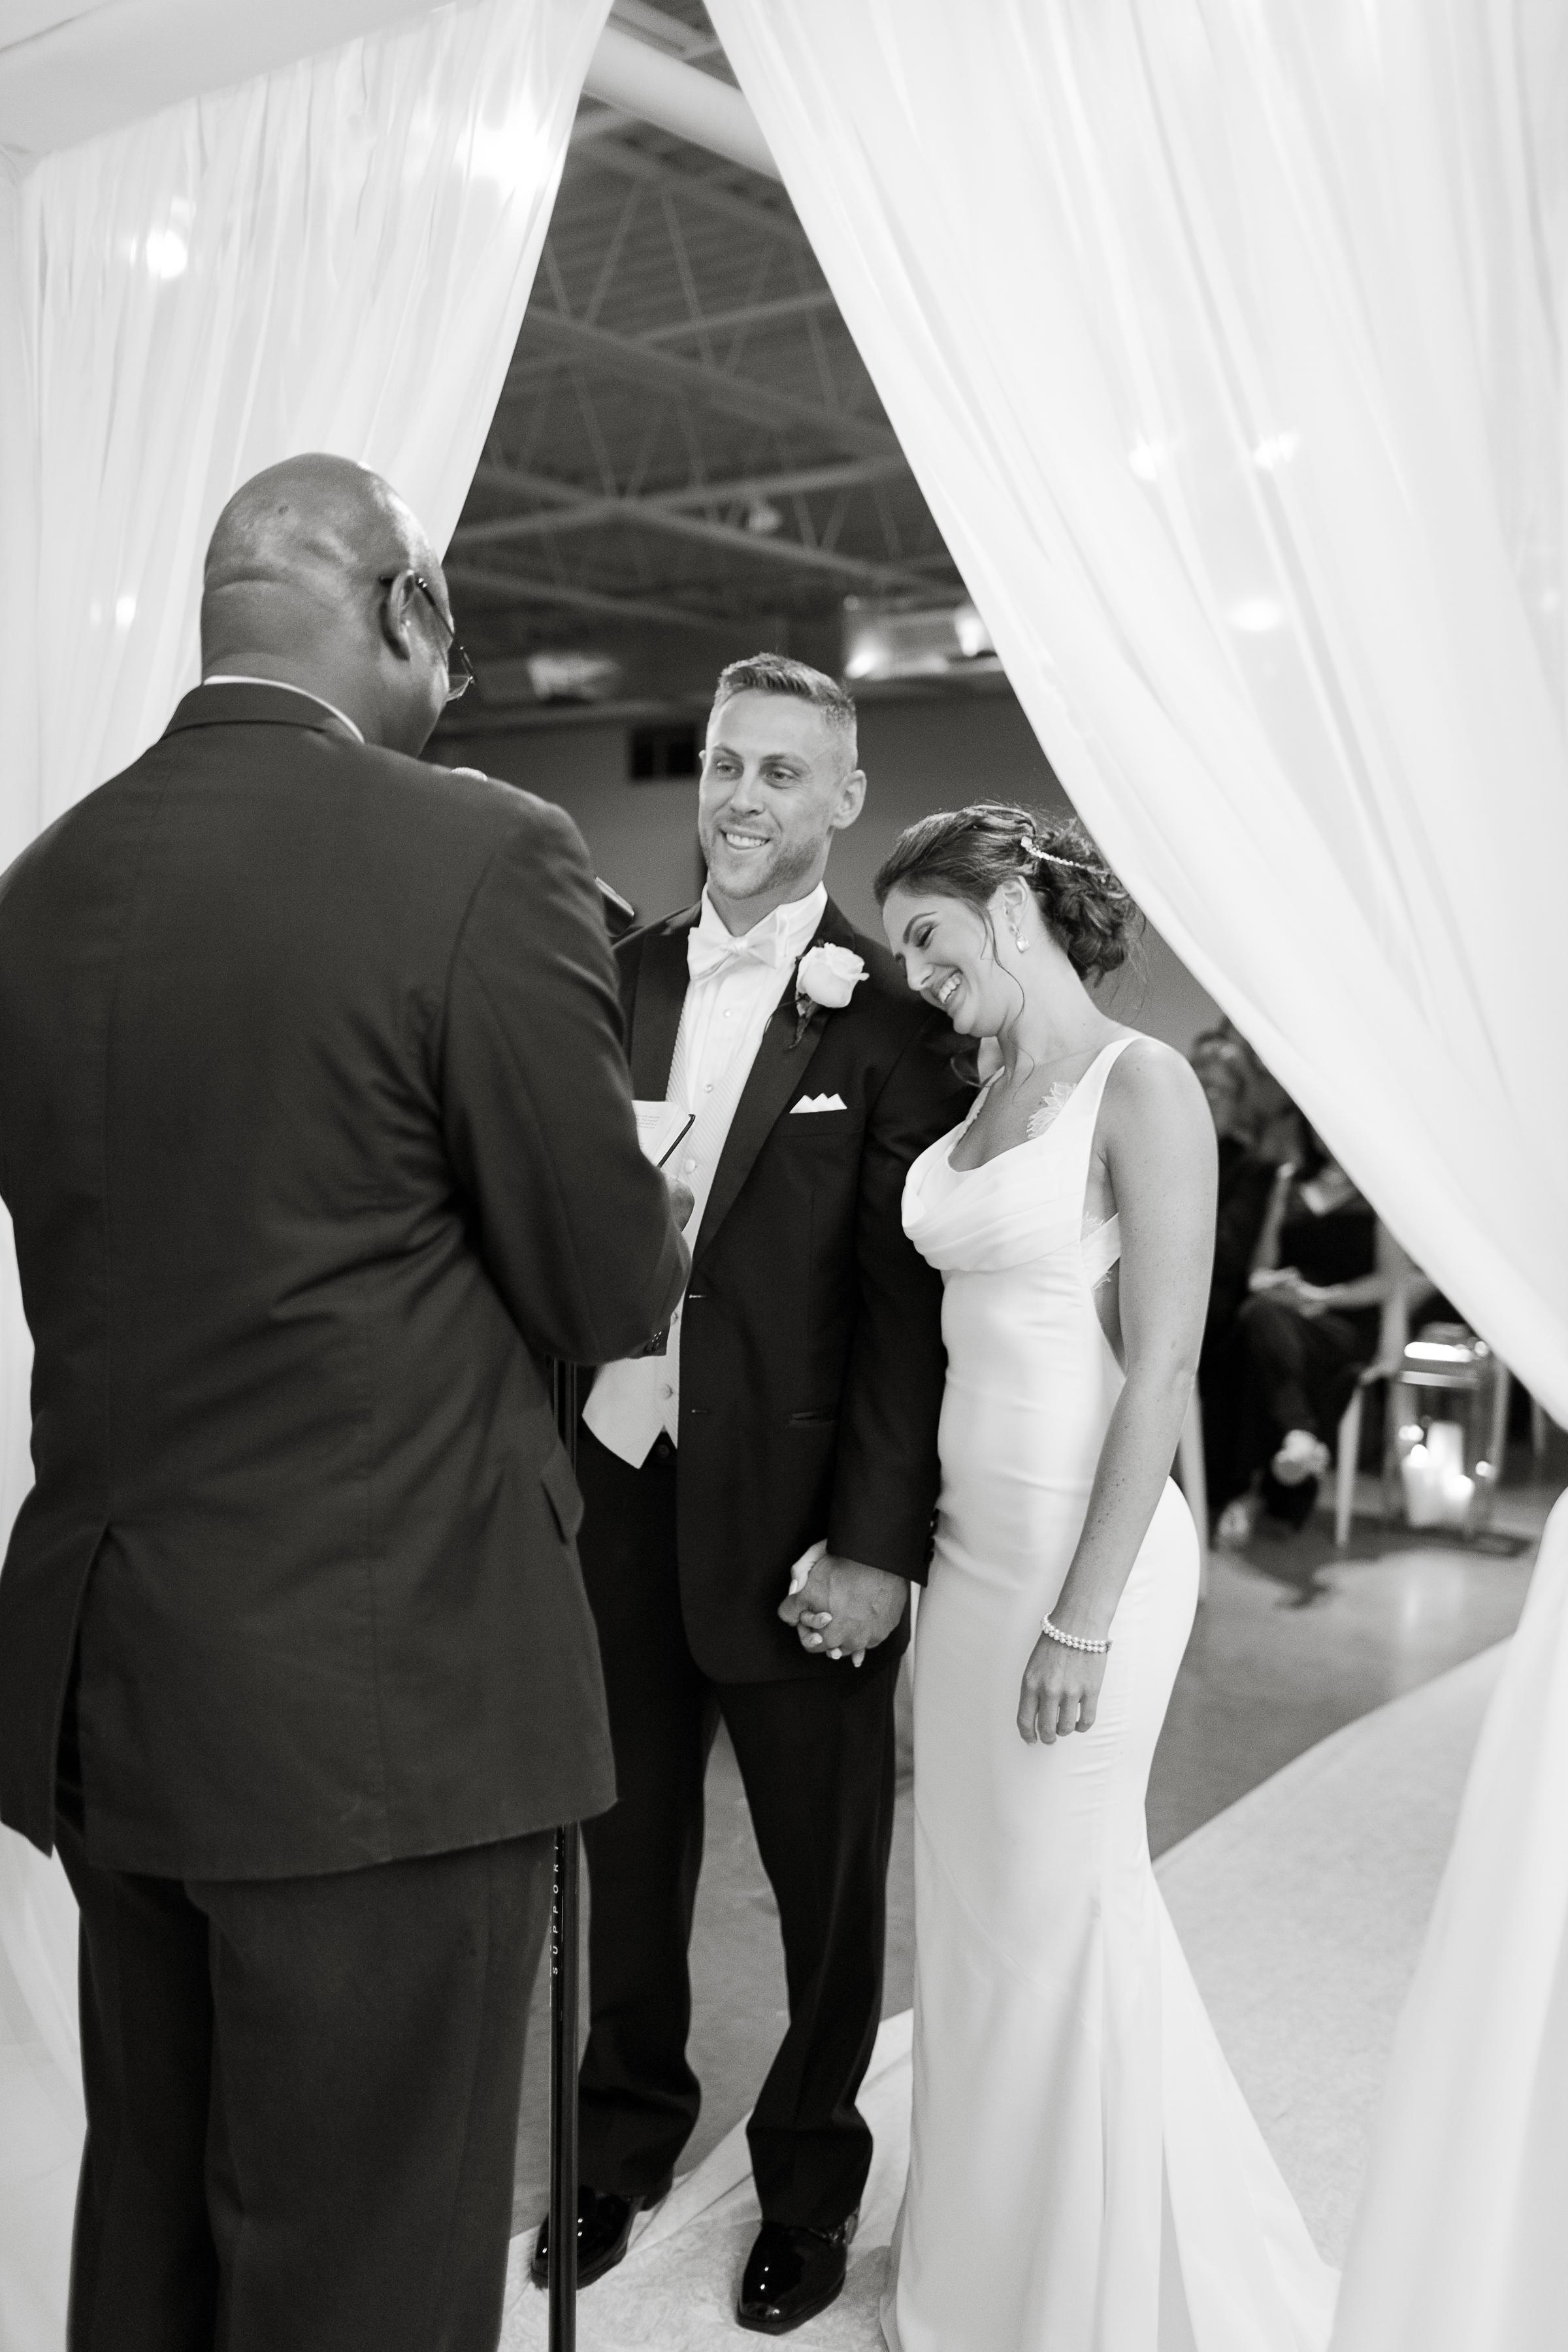 Melissa Kruse Photography - Genna + Anthony The Loading Dock Stamford CT Wedding-603.jpg